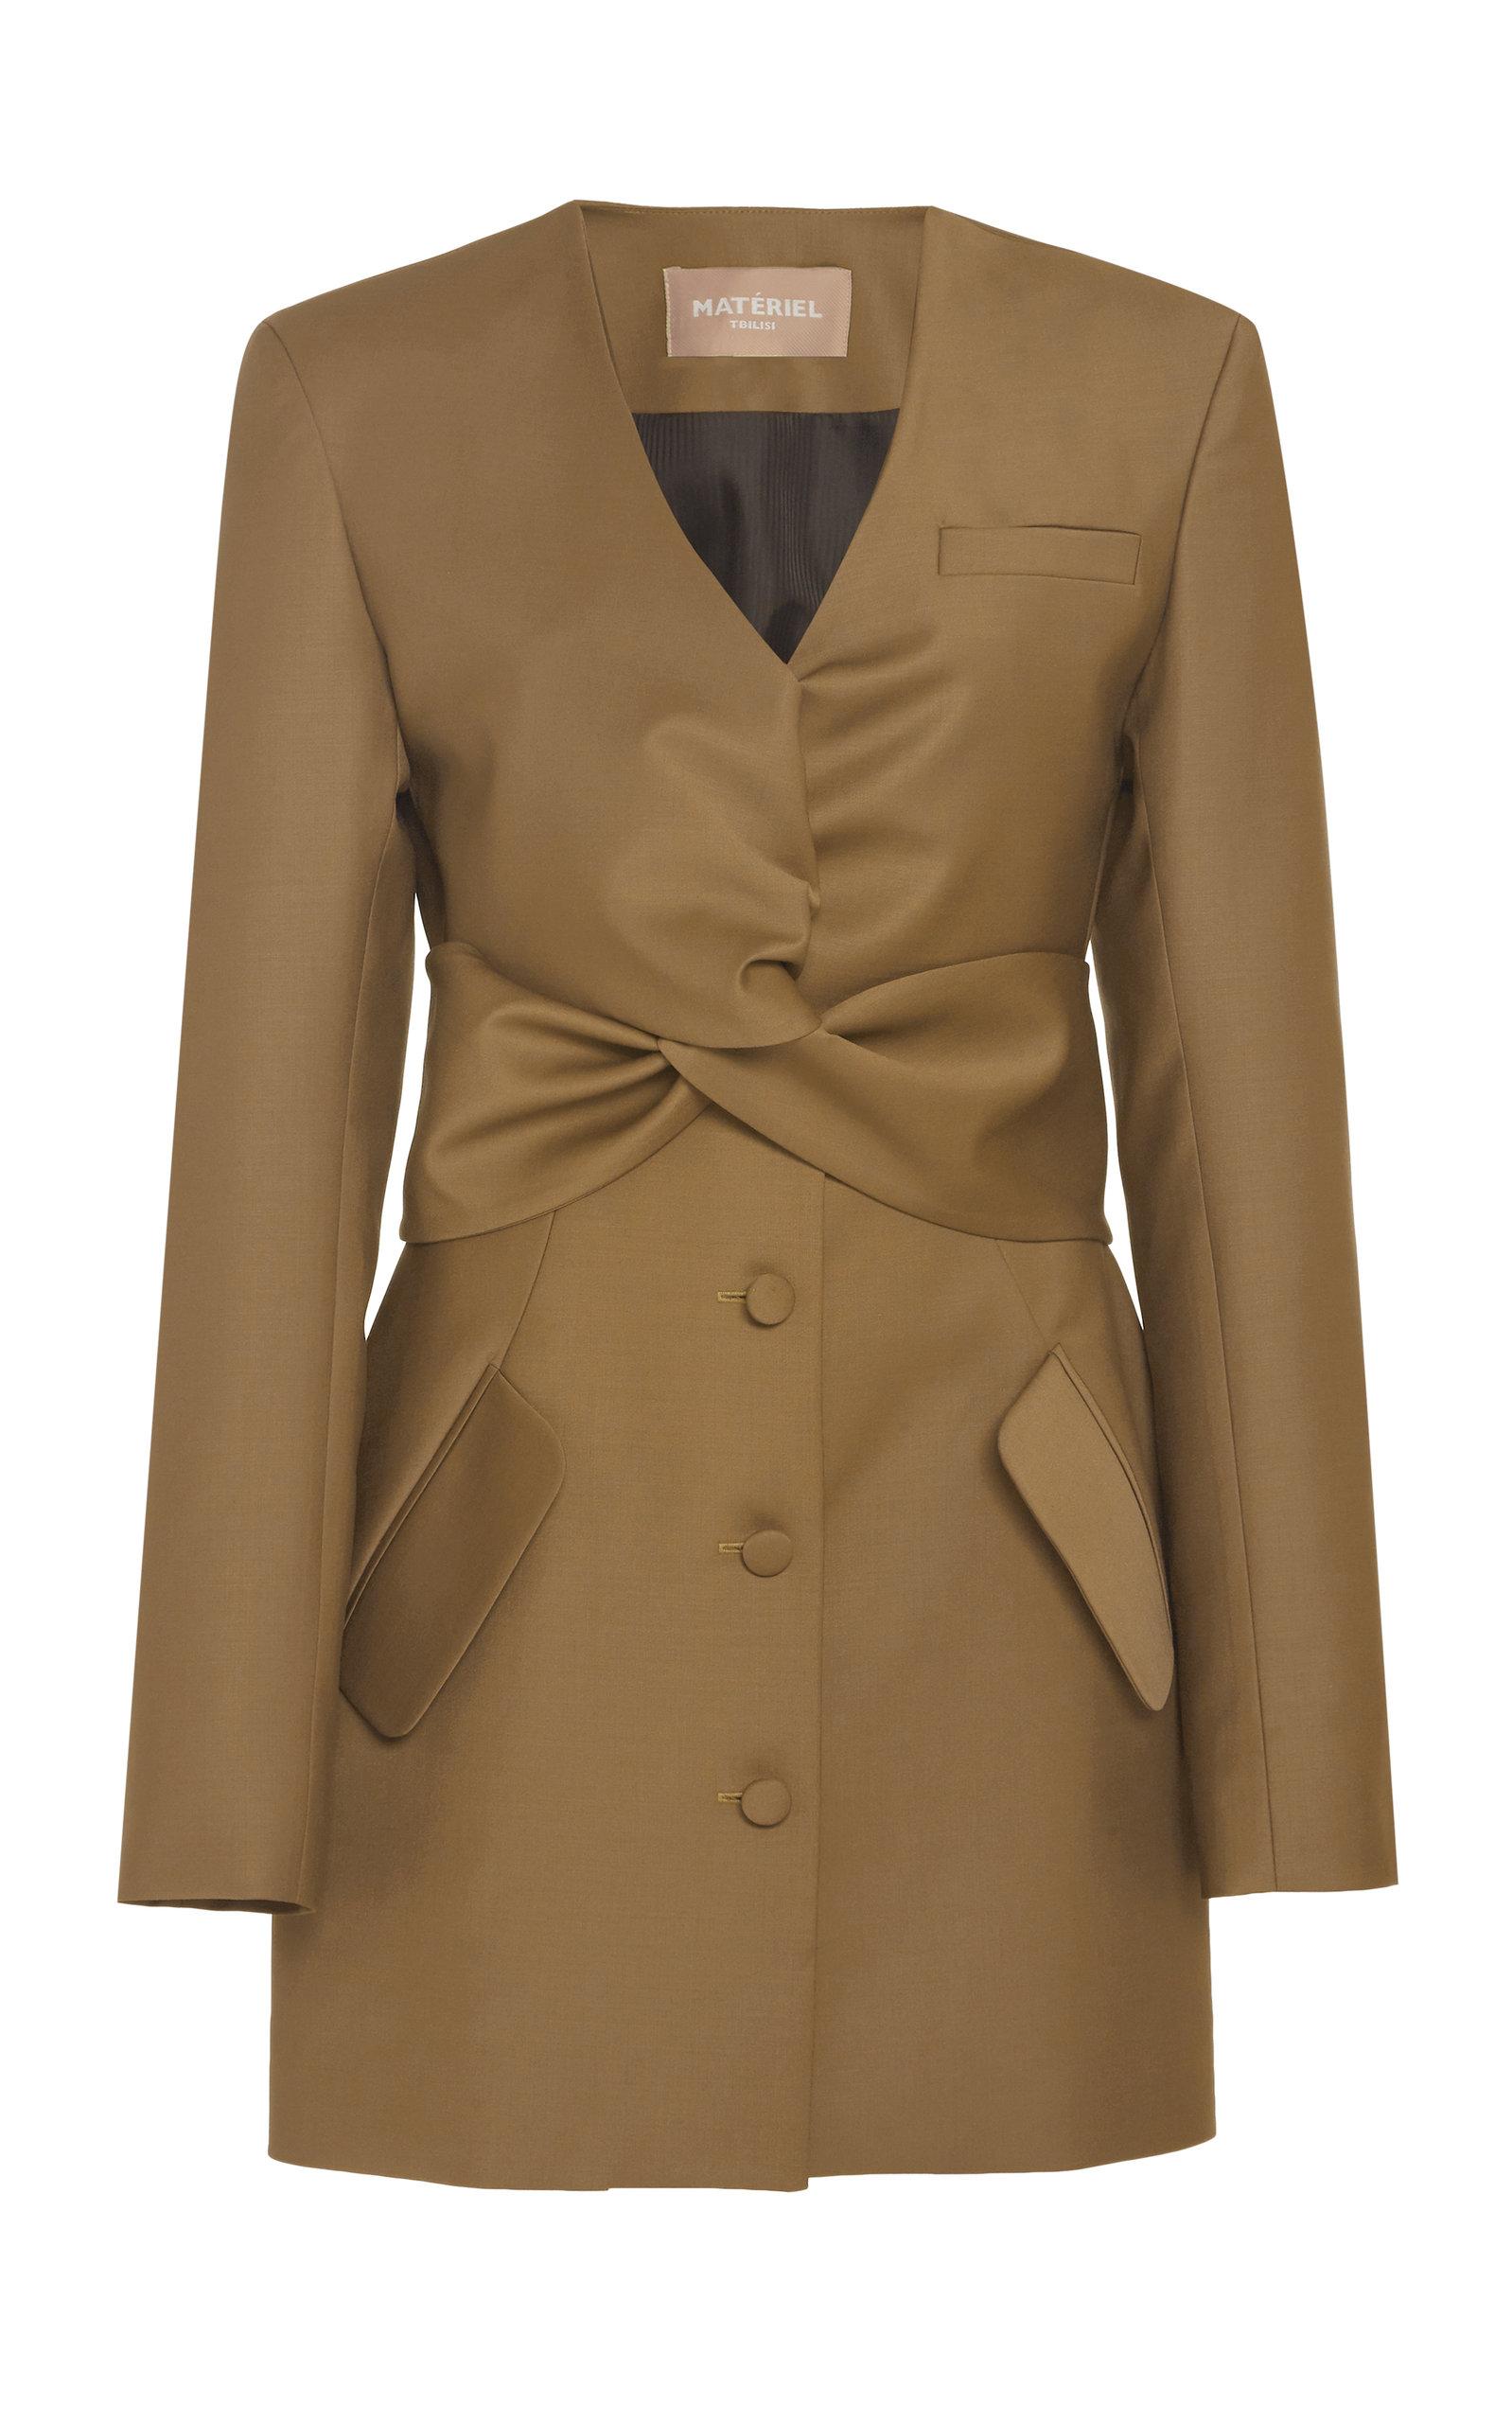 Buy MATÉRIEL Tie-Detailed Wool-Blend Blazer Dress online, shop MATÉRIEL at the best price